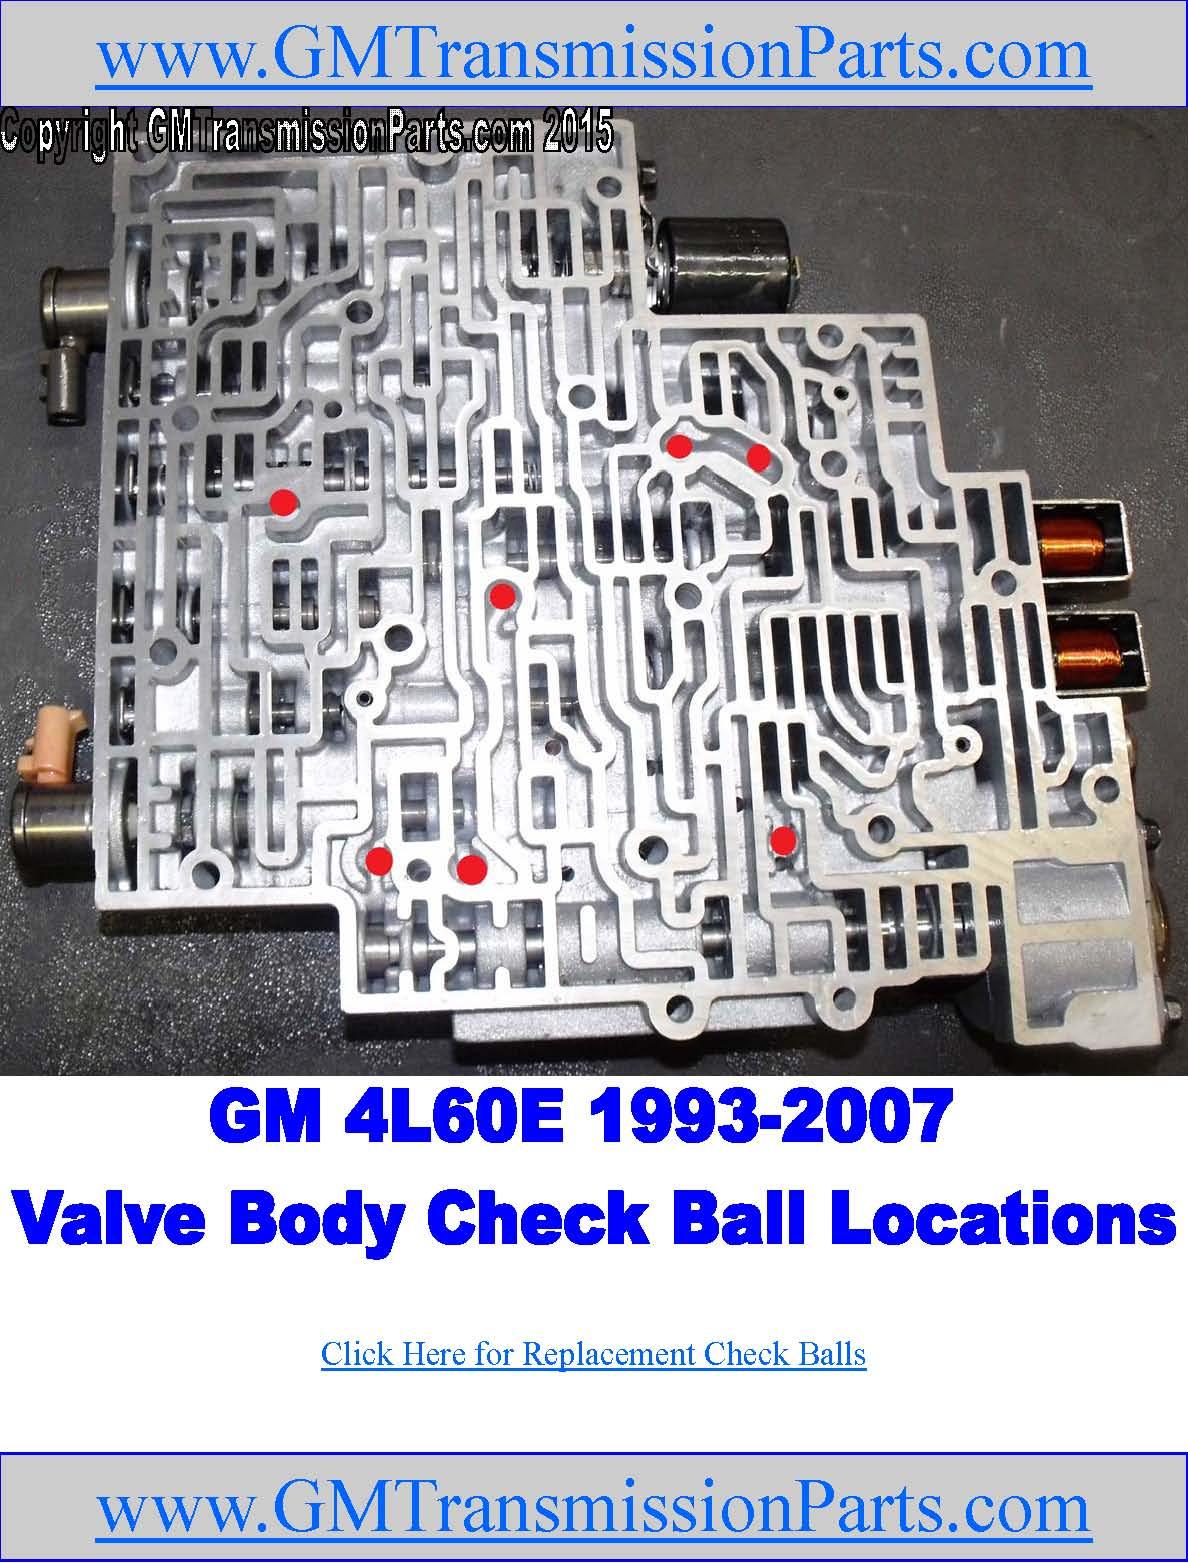 Chevy Auto Transmission Diagram Electrical Wiring Diagrams 2001 Gmc Van Gm 4t60e Schematics U2022